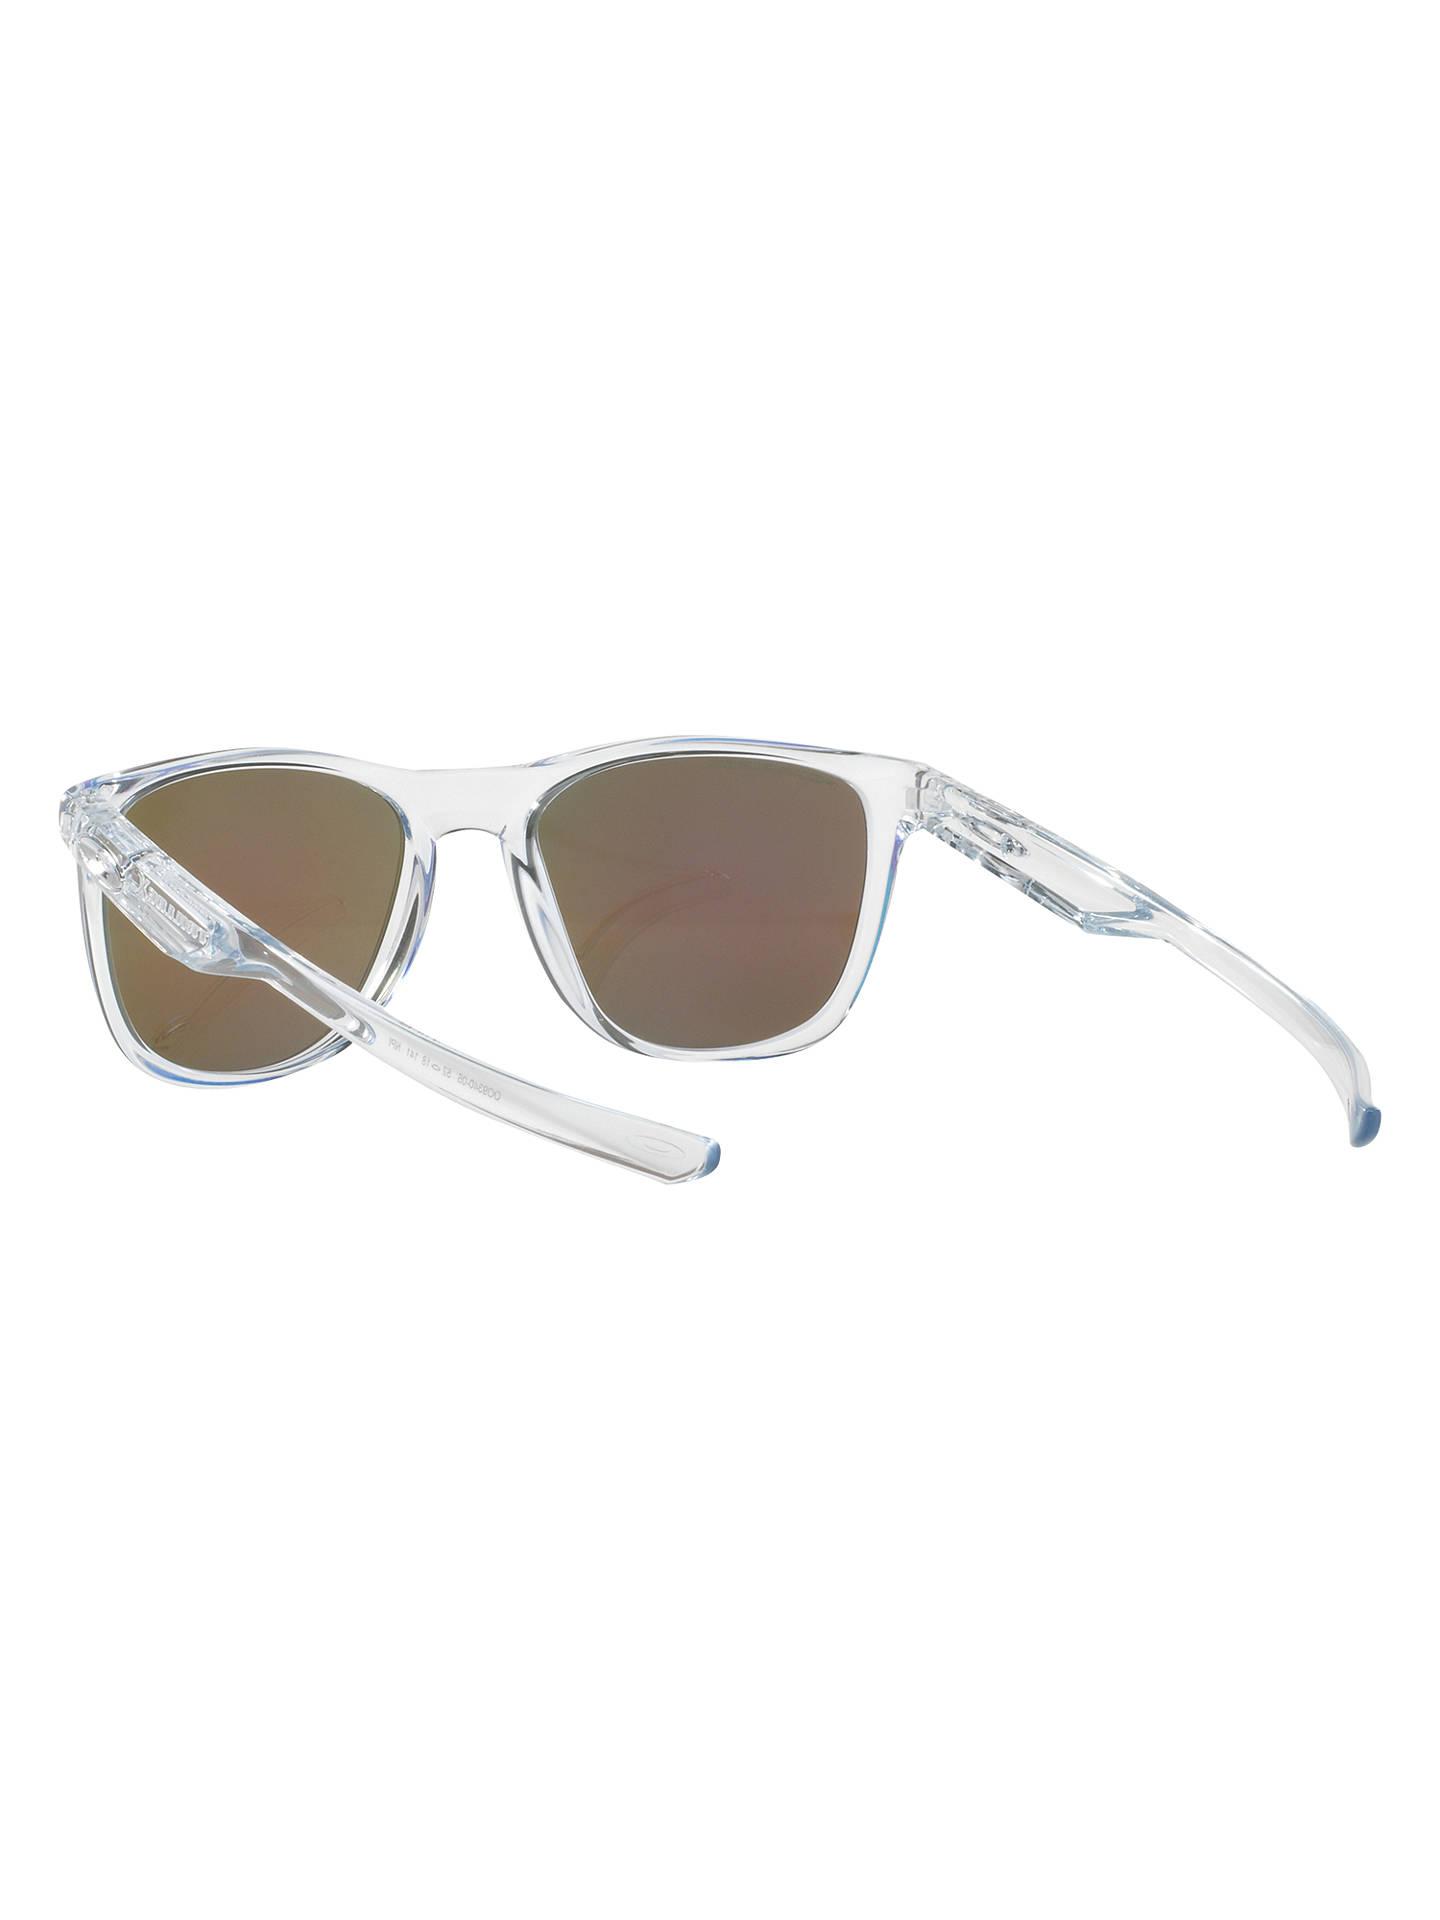 fe85423adcf Oakley OO9340 Trillbe X Polarised Square Sunglasses at John Lewis ...